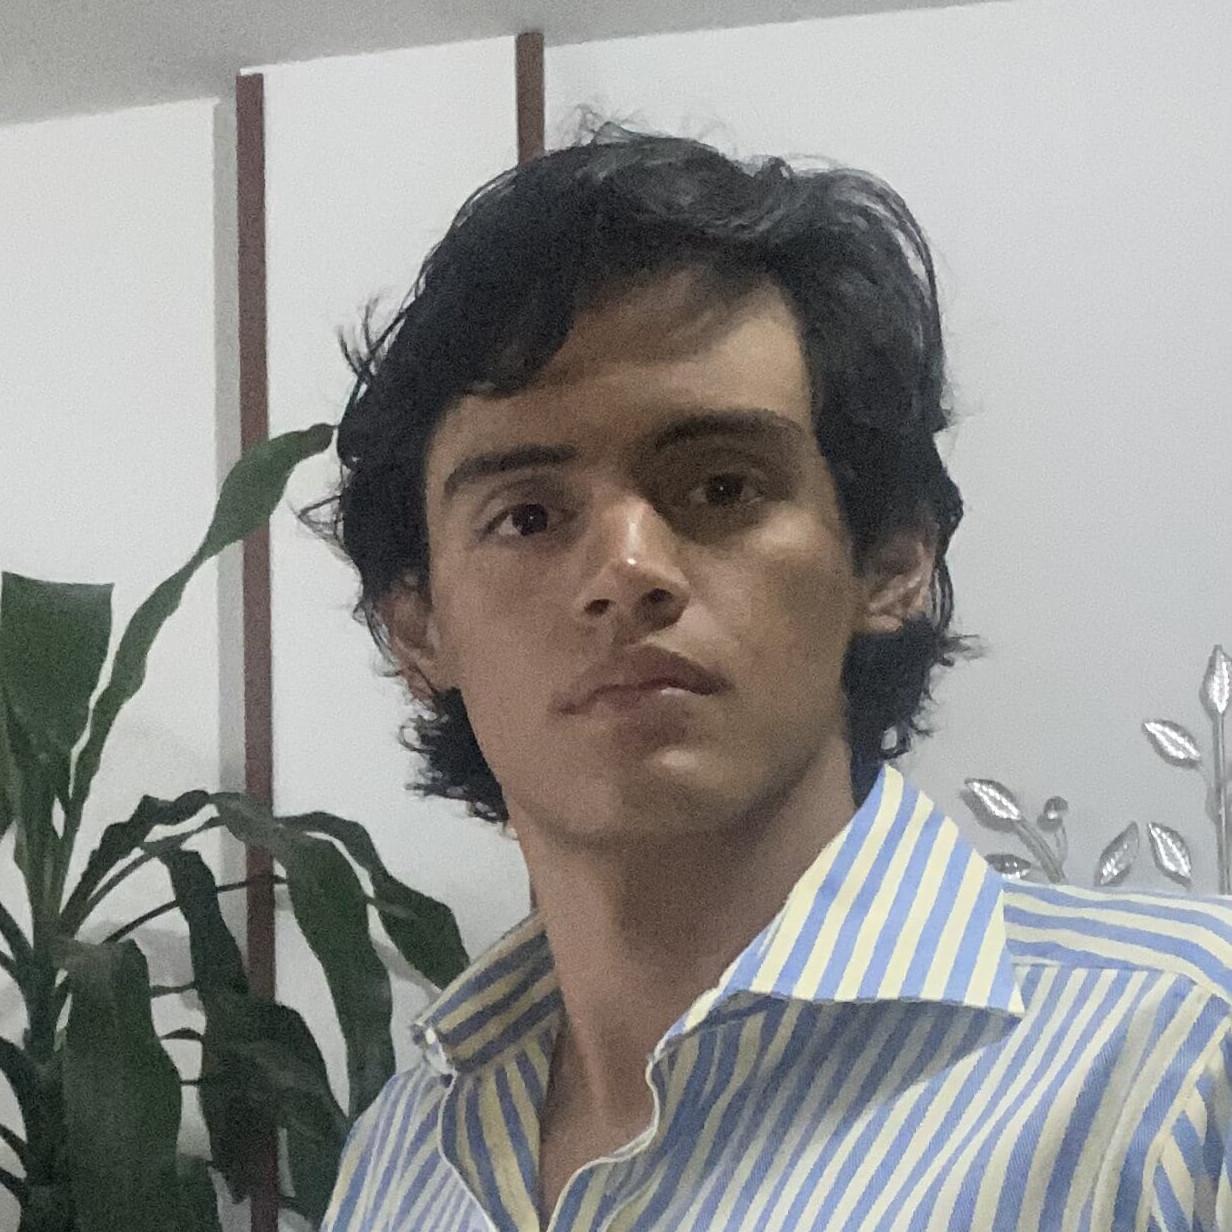 Fabian Parra